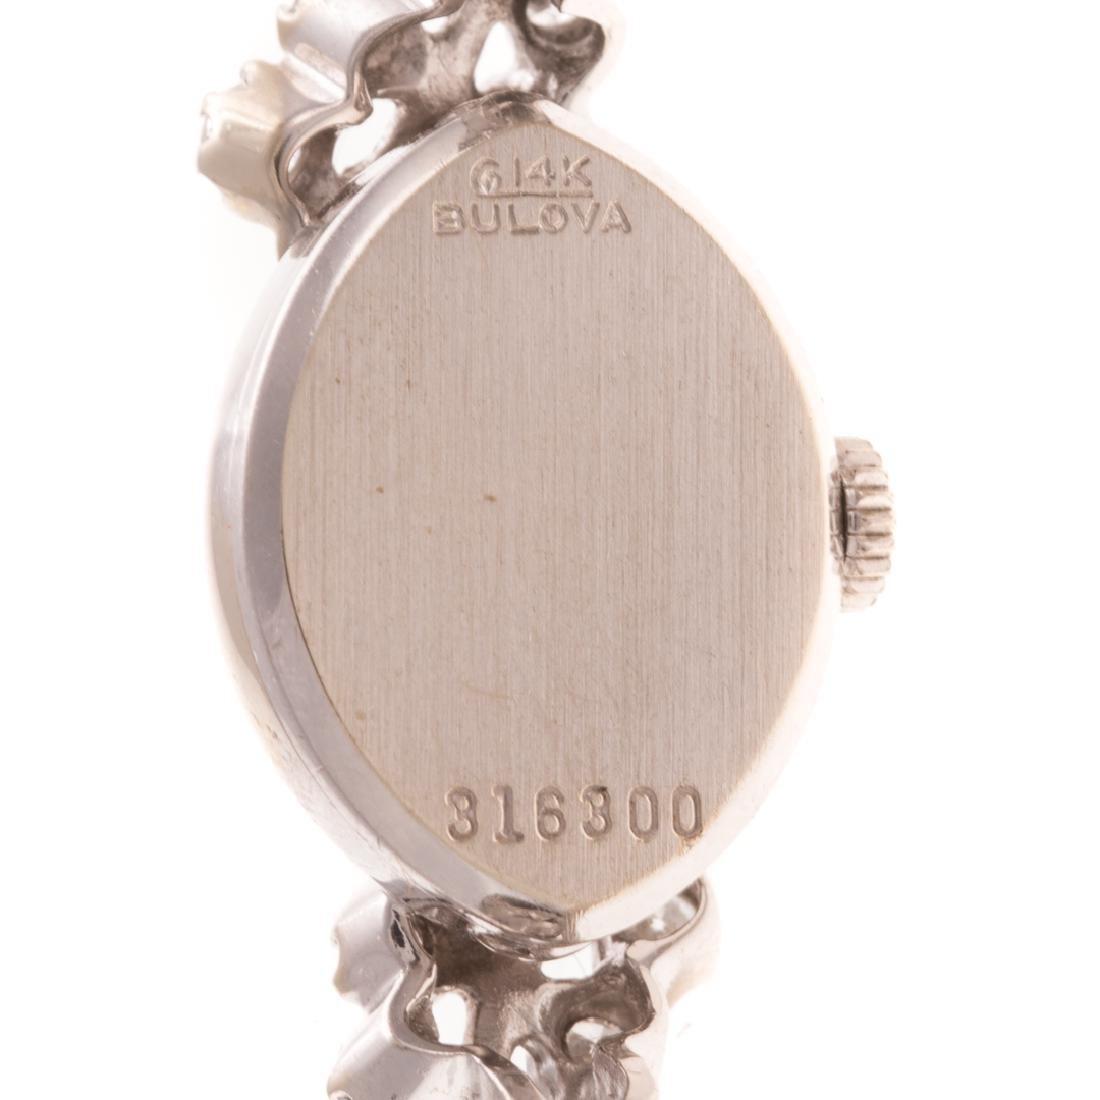 A Pair of Lady's Vintage 14K Bulova Dress Watches - 5